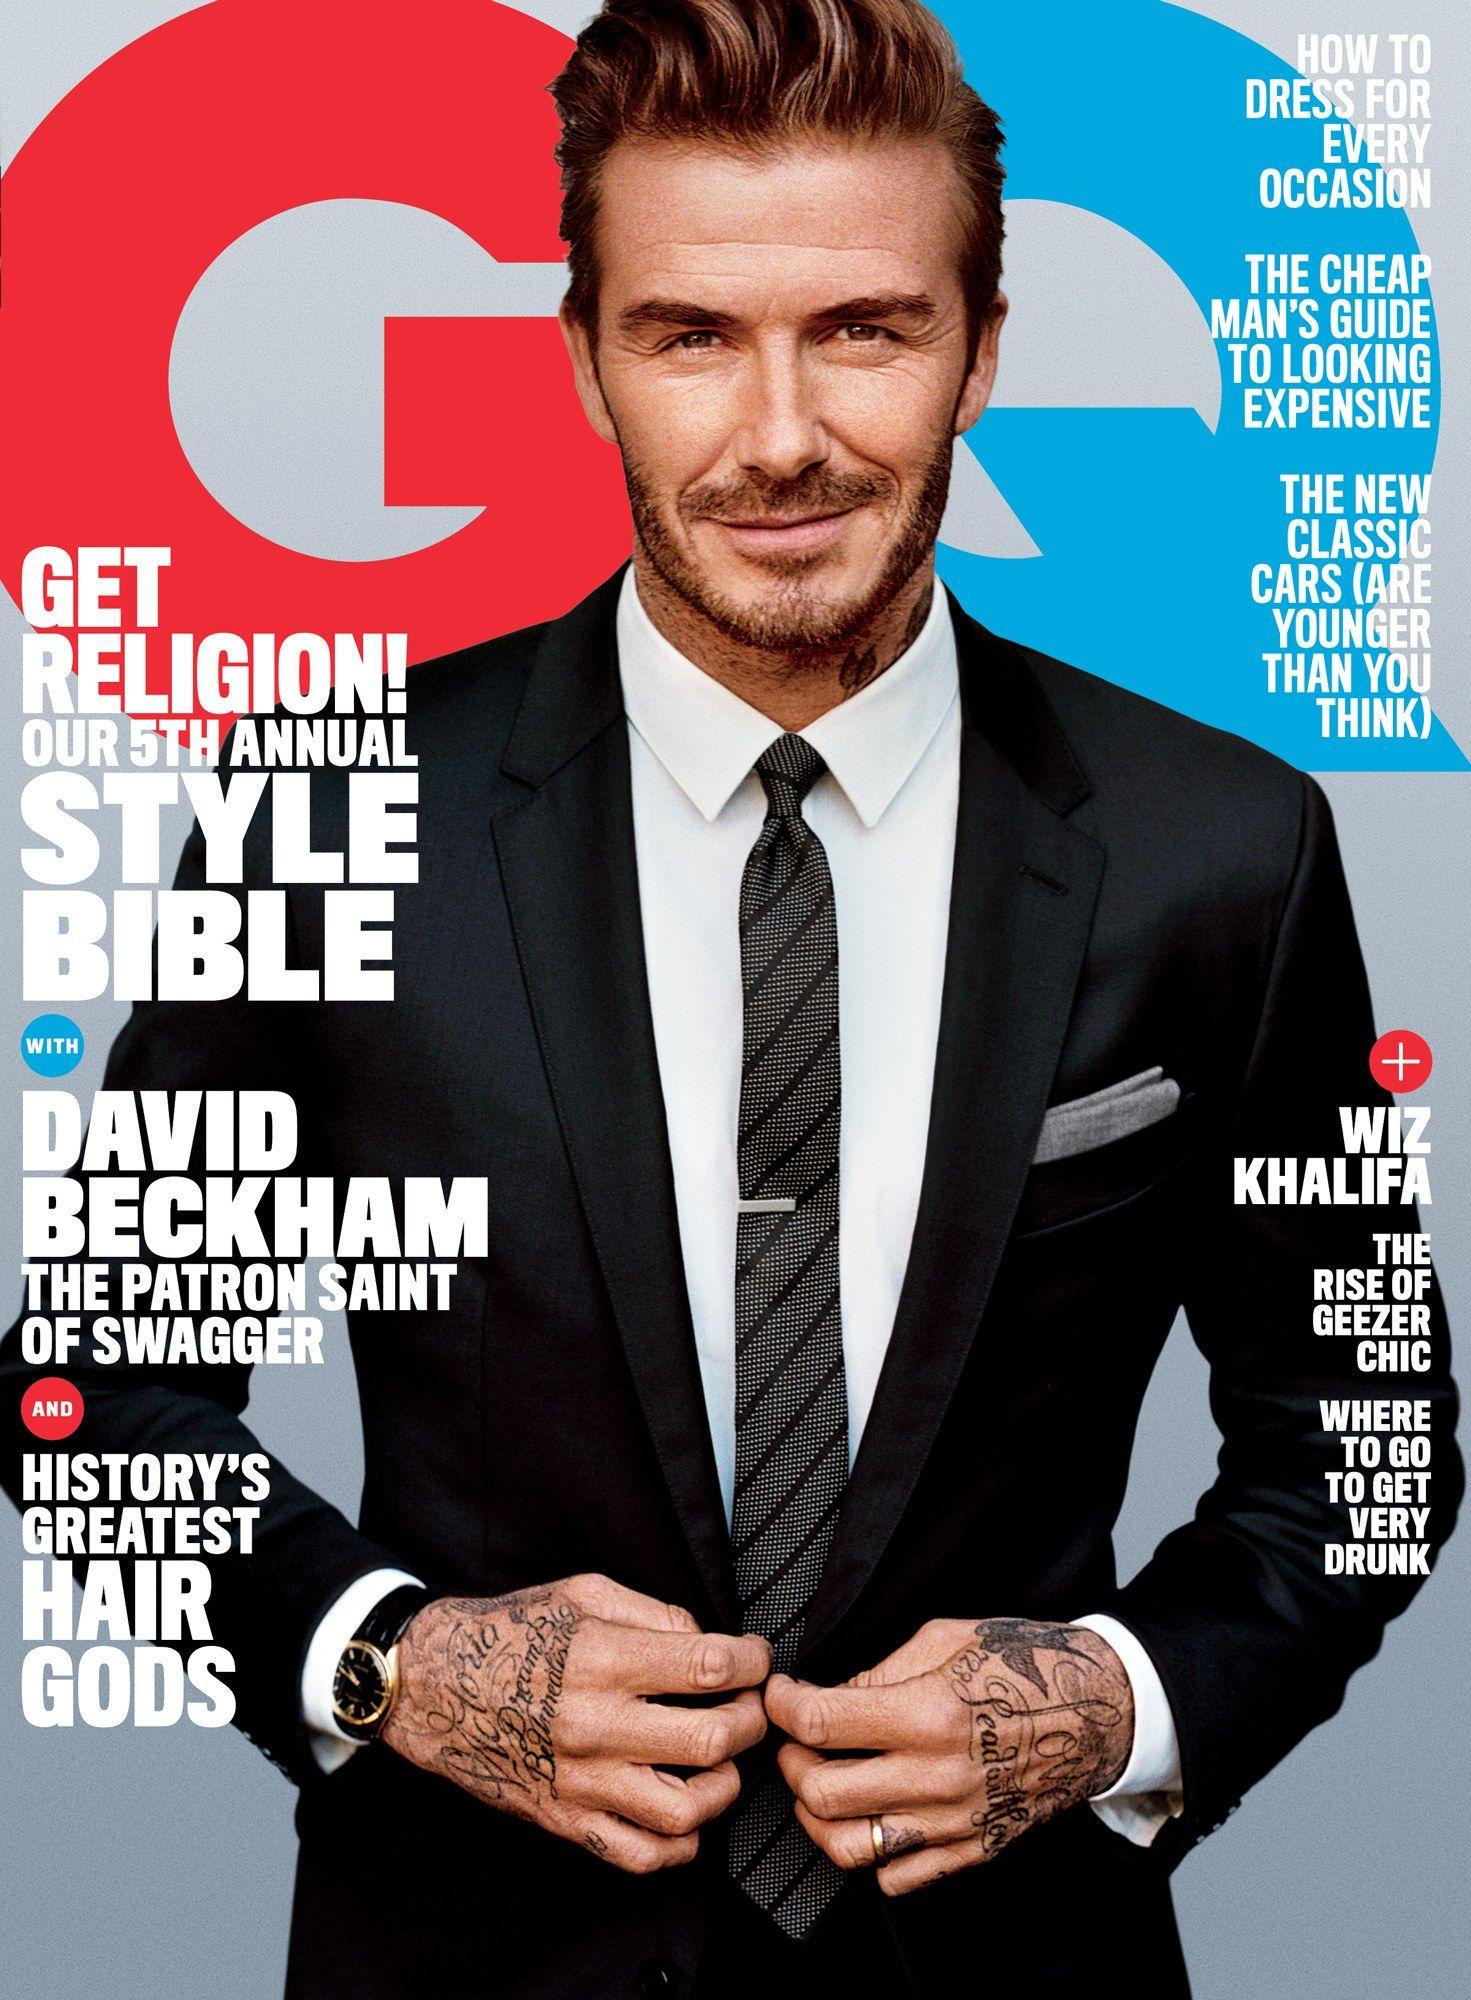 585ad2790 David Beckham by Alesdair McLellan for GQ April 2016 Cover #dgman ...